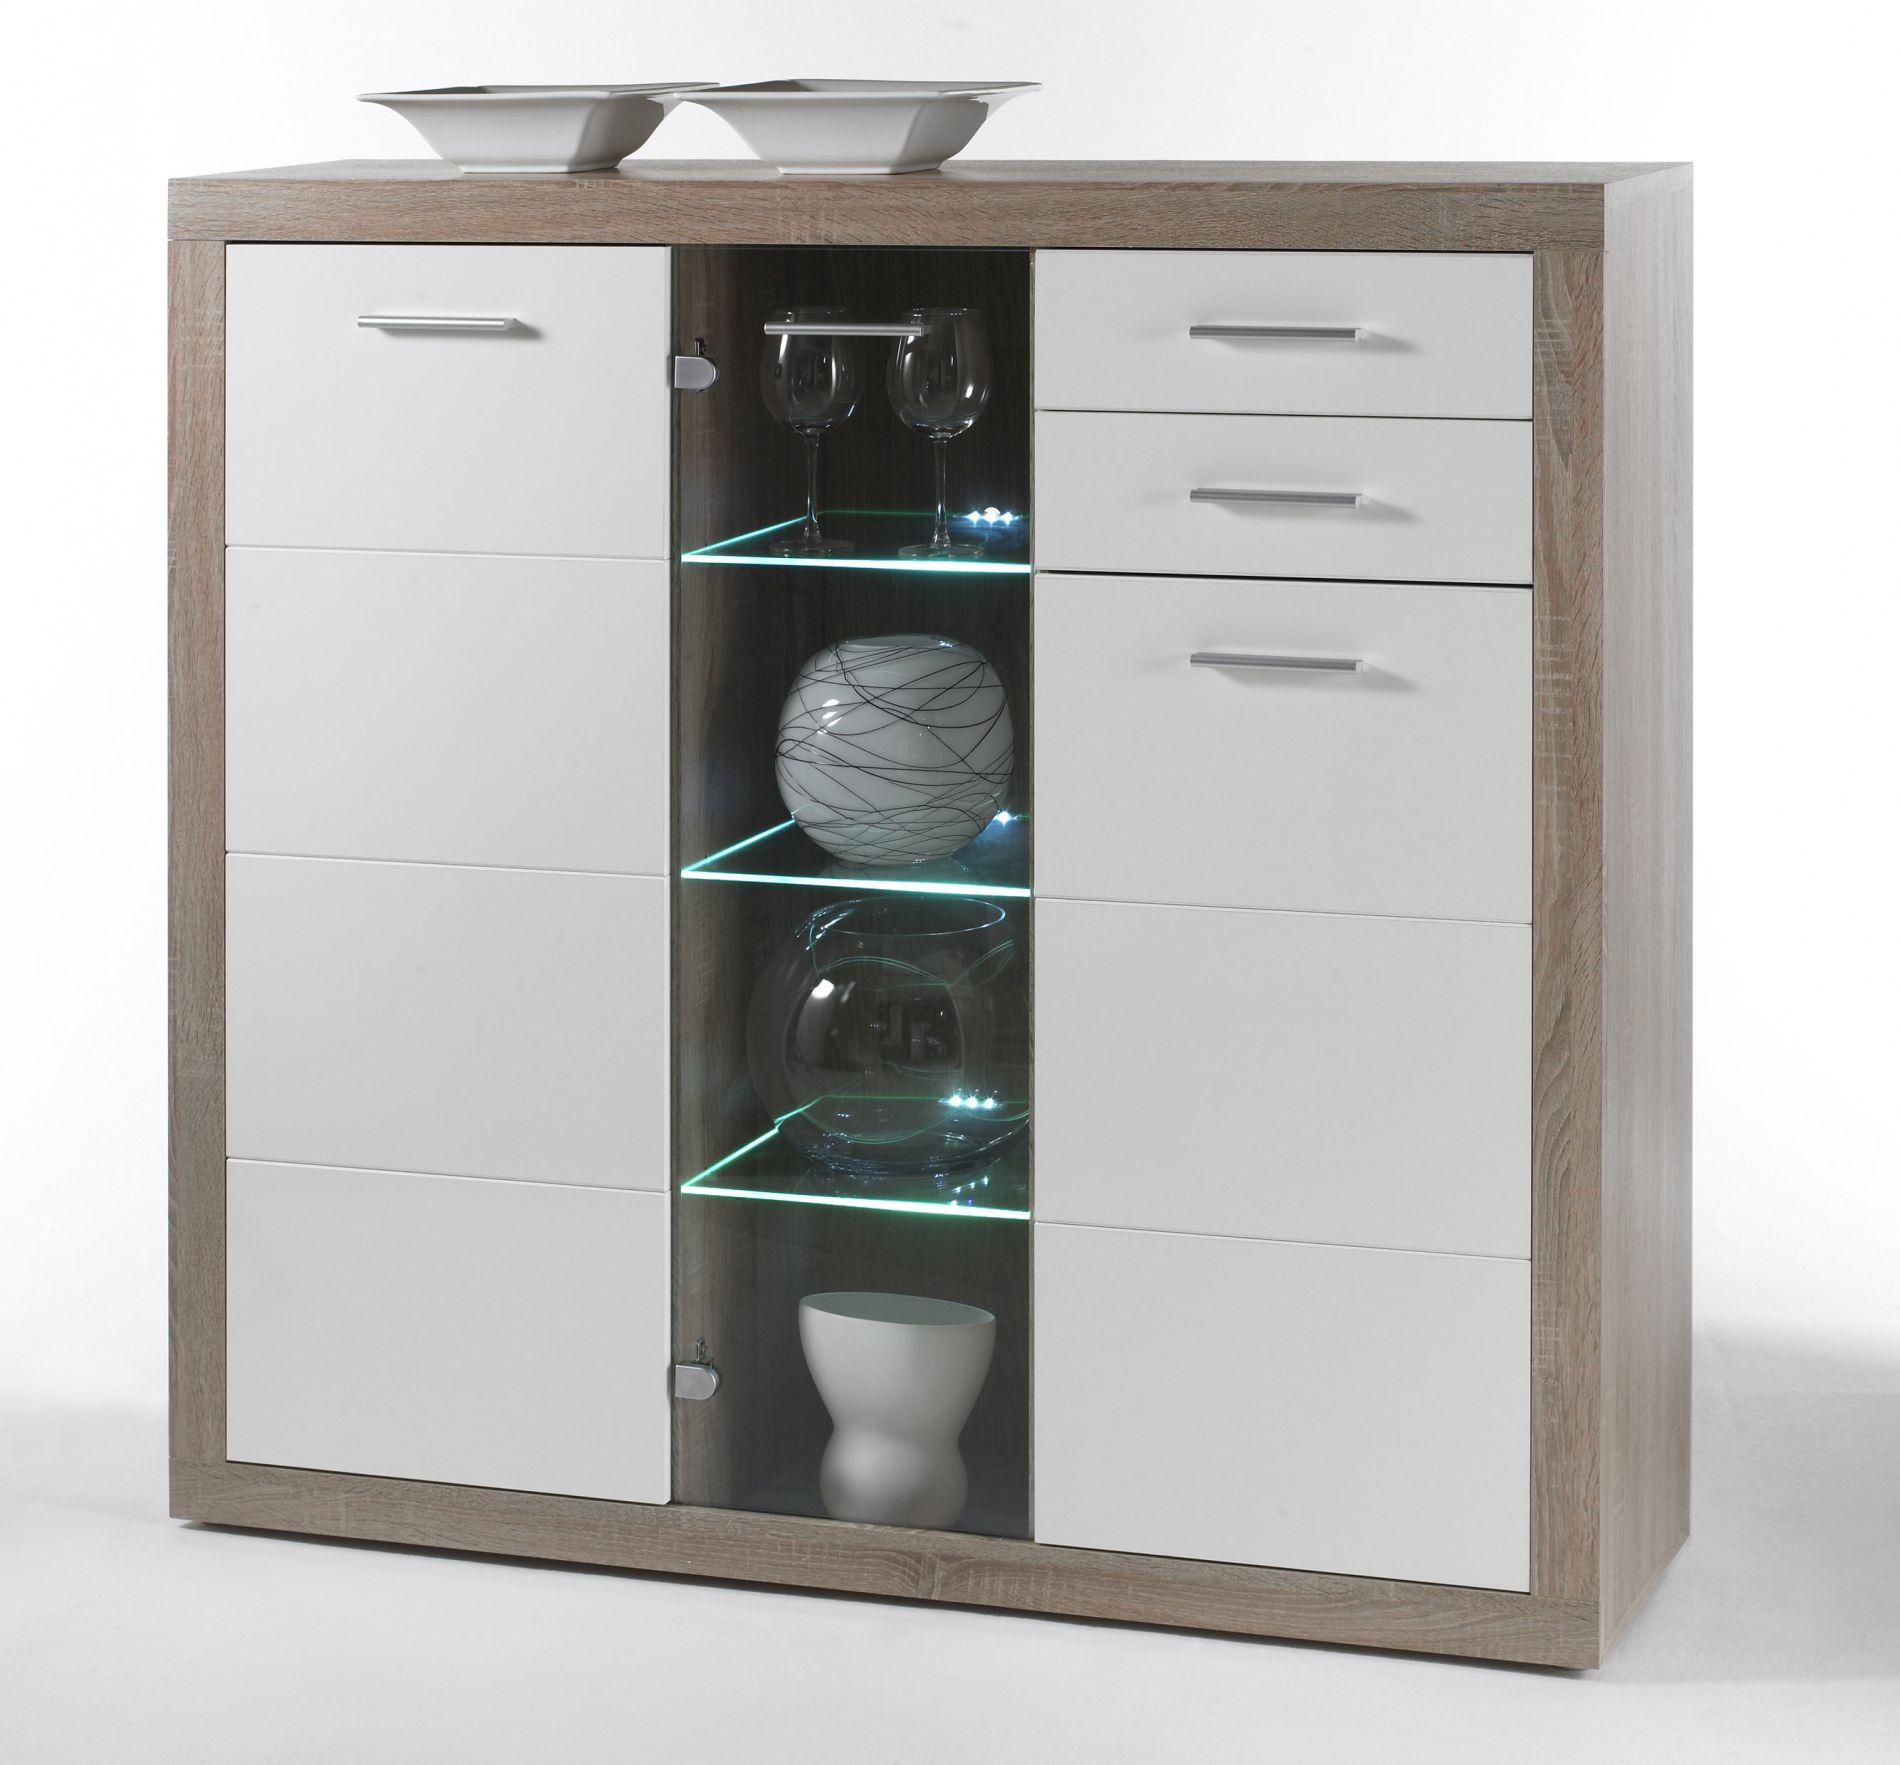 highboard cancan t2 wohnprogramme wohnzimmer. Black Bedroom Furniture Sets. Home Design Ideas